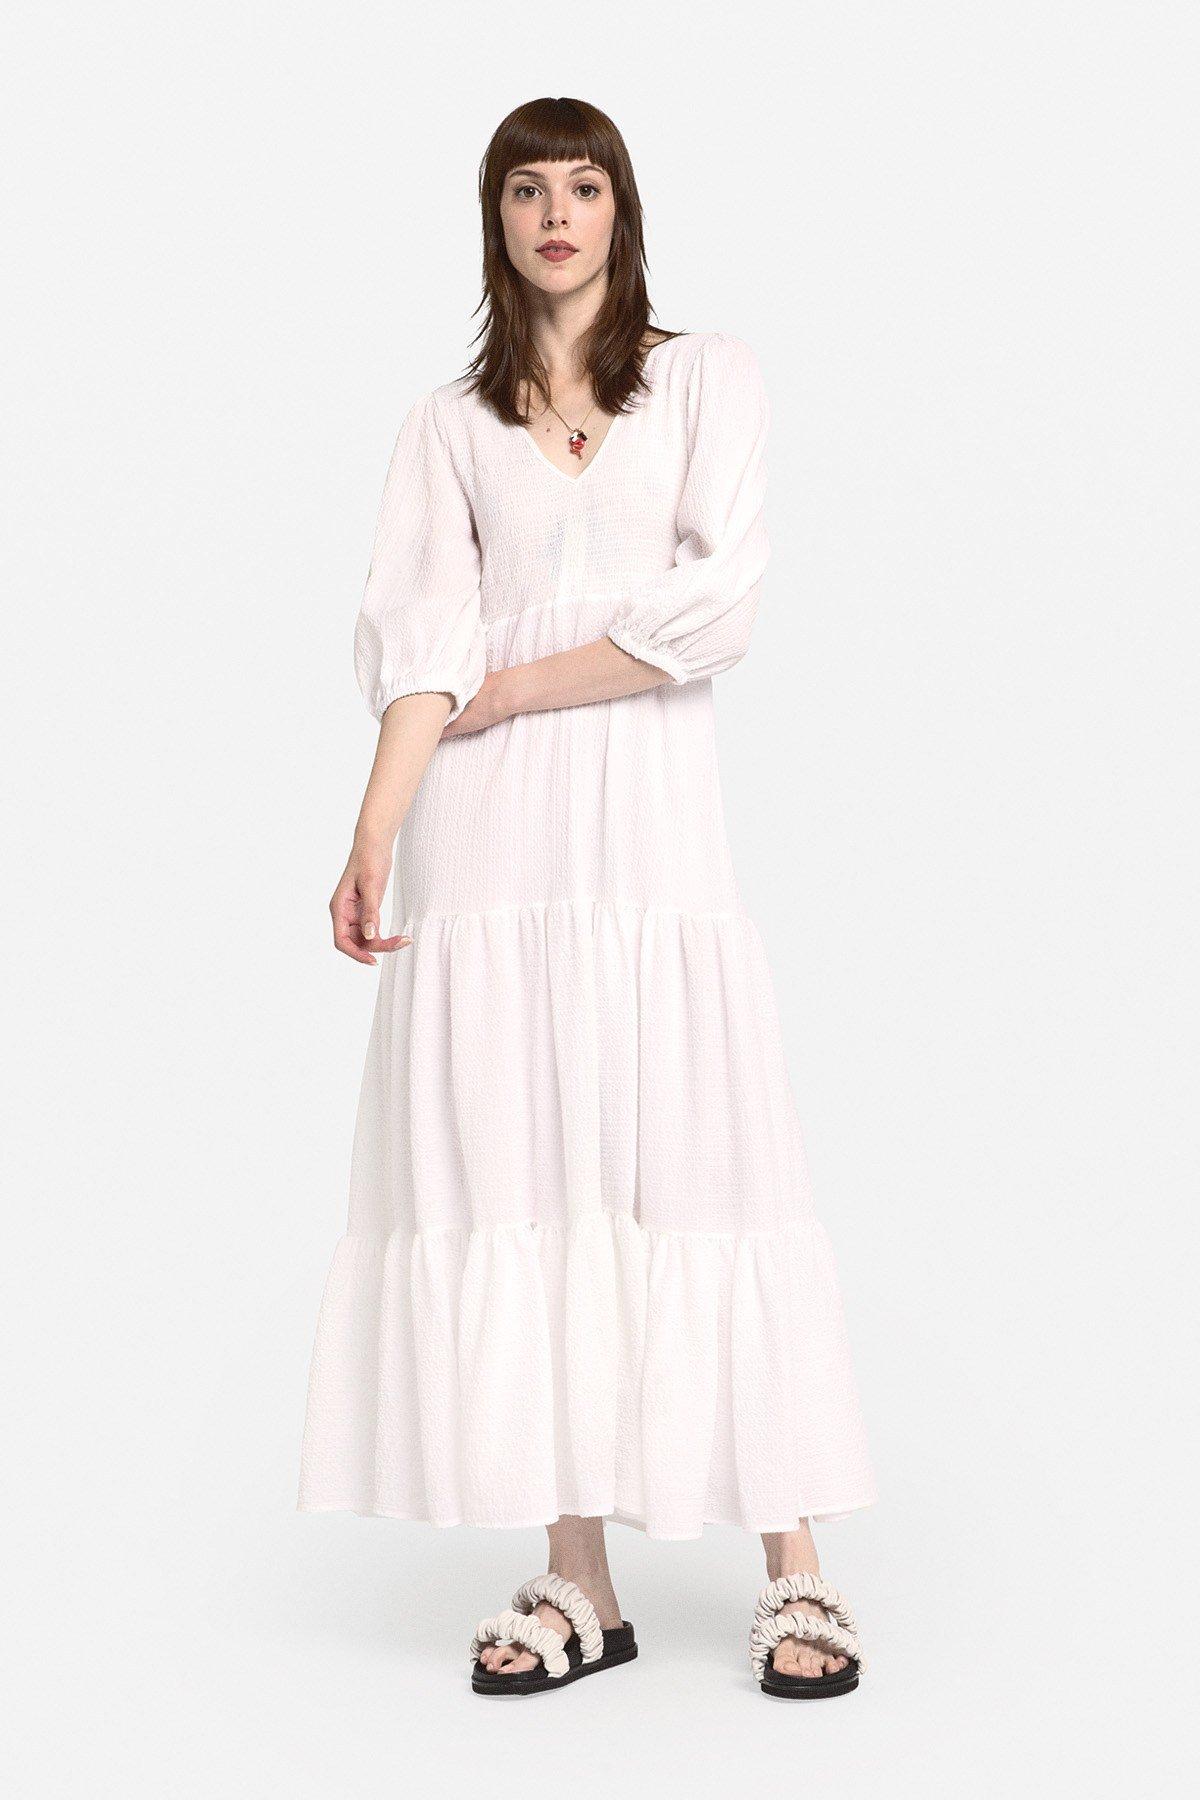 Oversized cotton dress with maxi ruffles